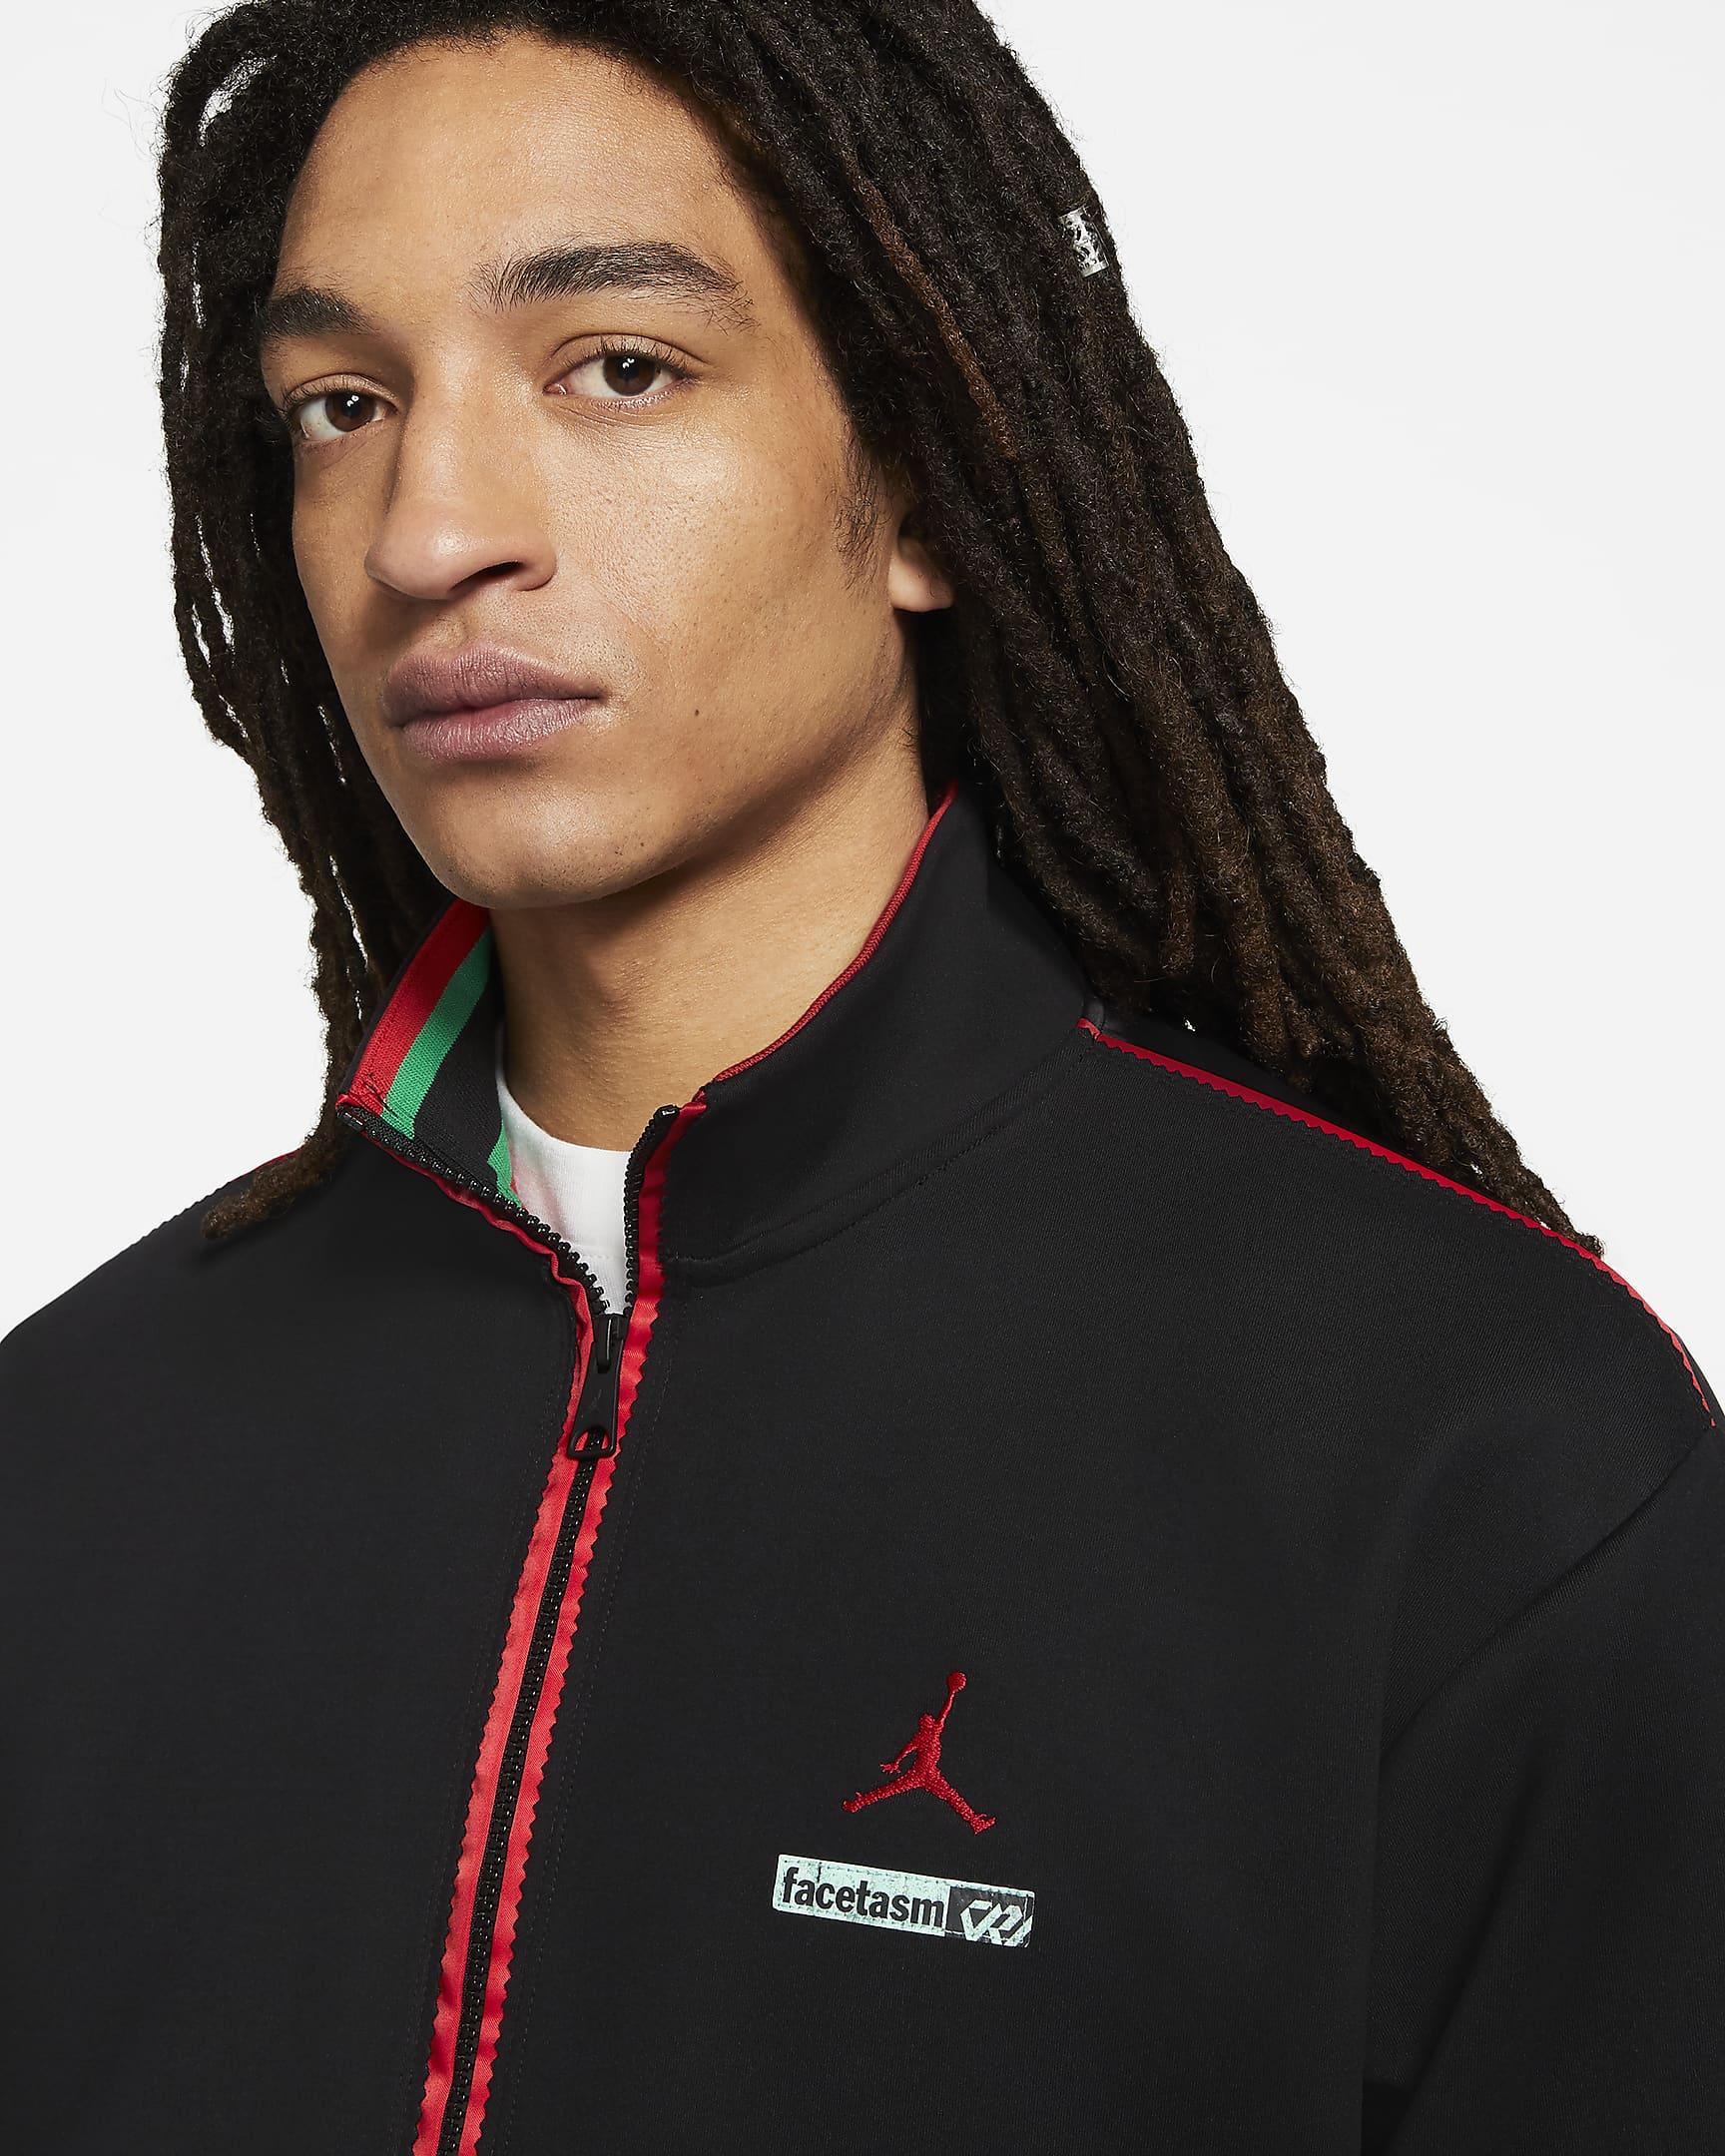 jordan-why-not-x-facetasm-mens-track-jacket-CmdpQ2-1